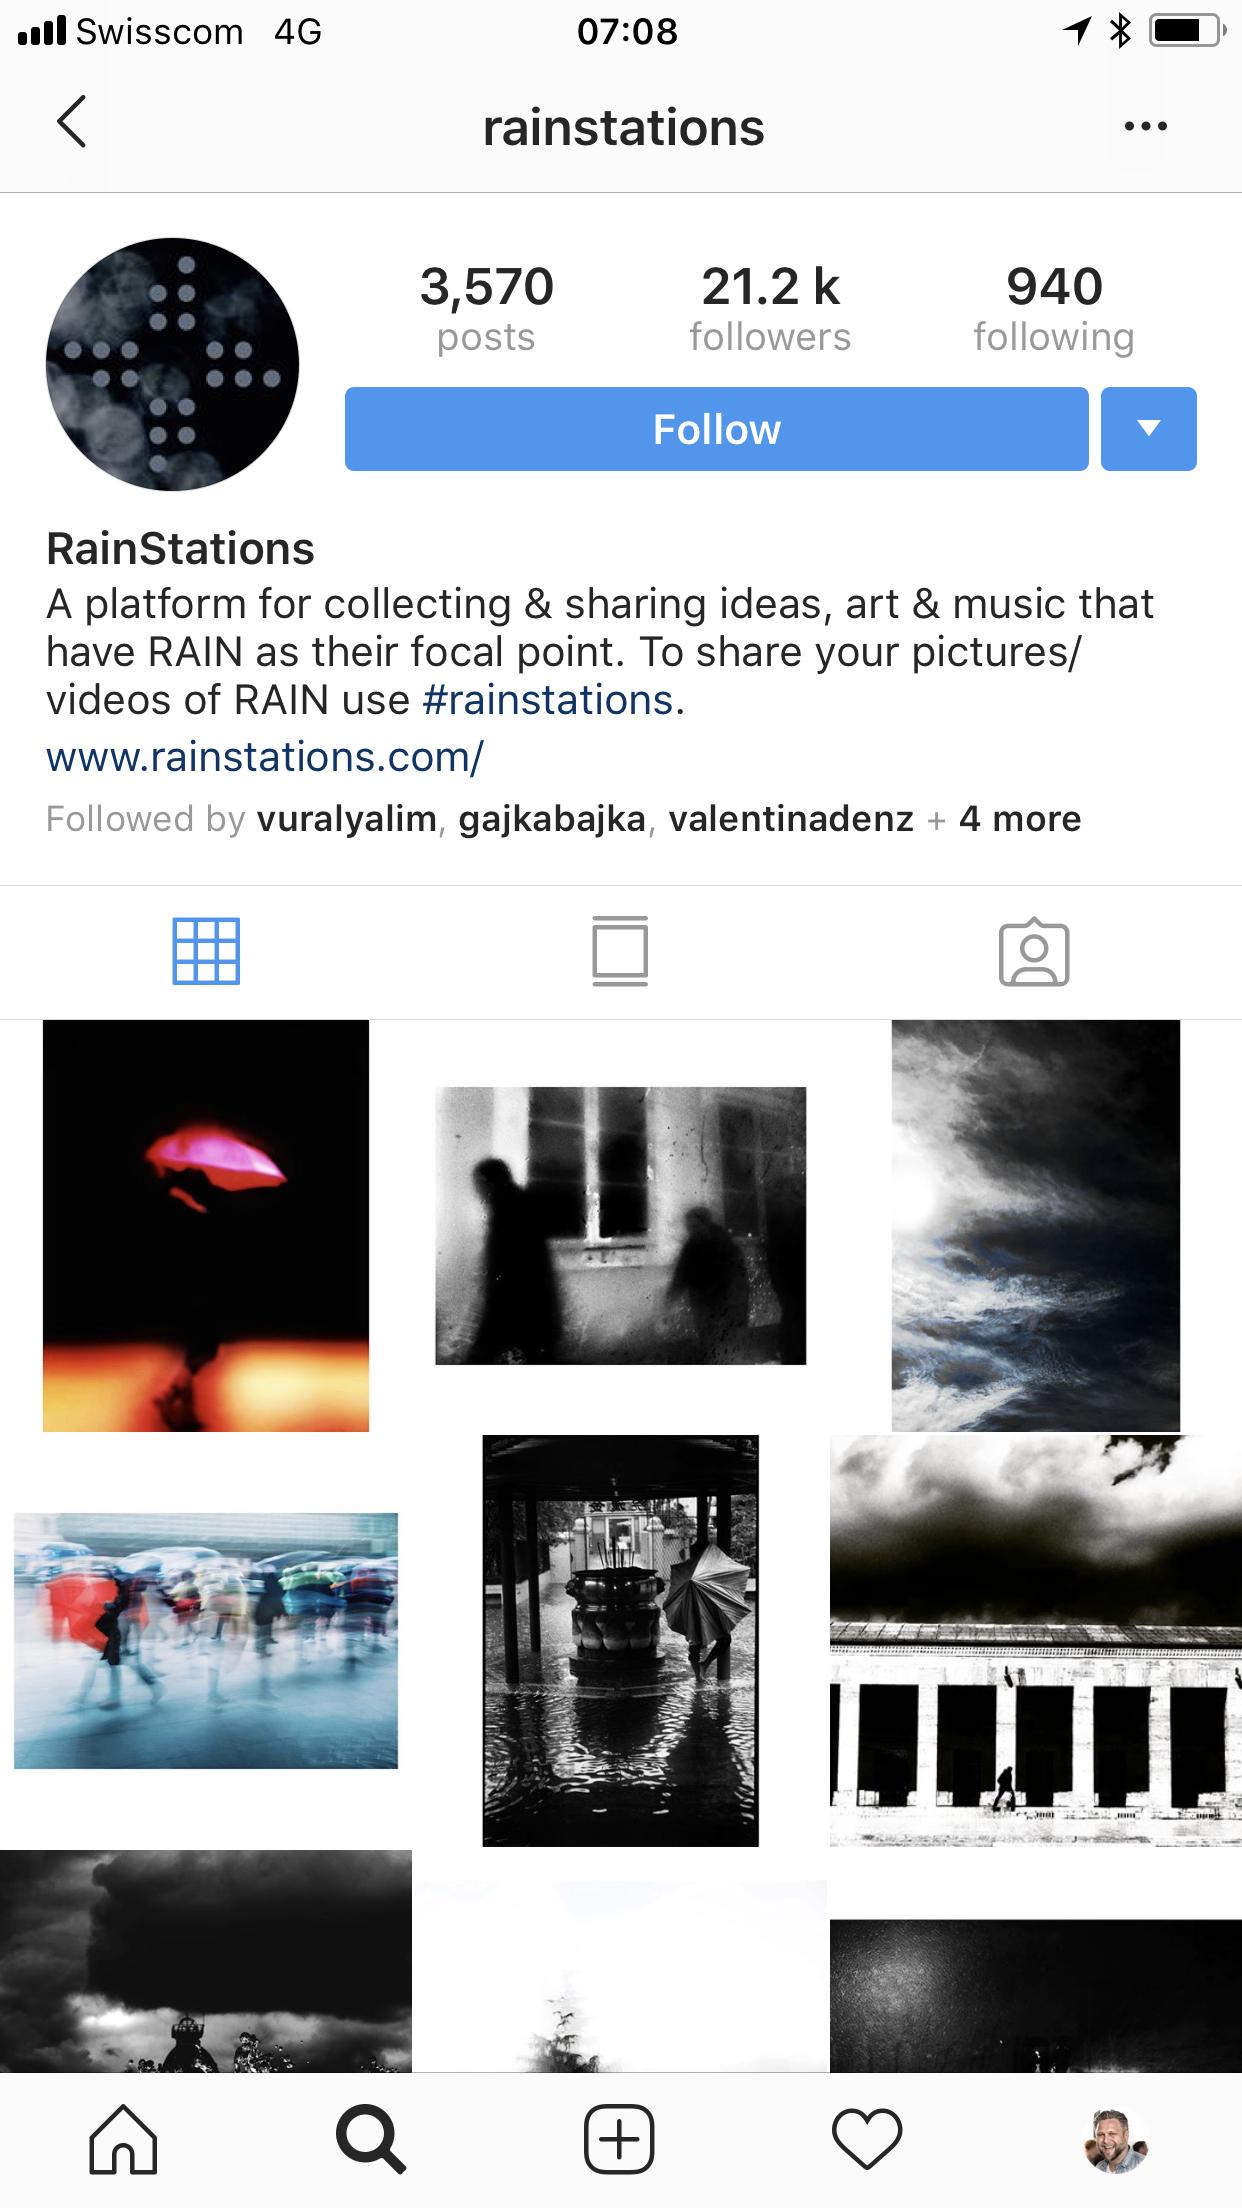 Dan_Roznov_Instagram_Storytelling_digitalEVENT2018_9.png